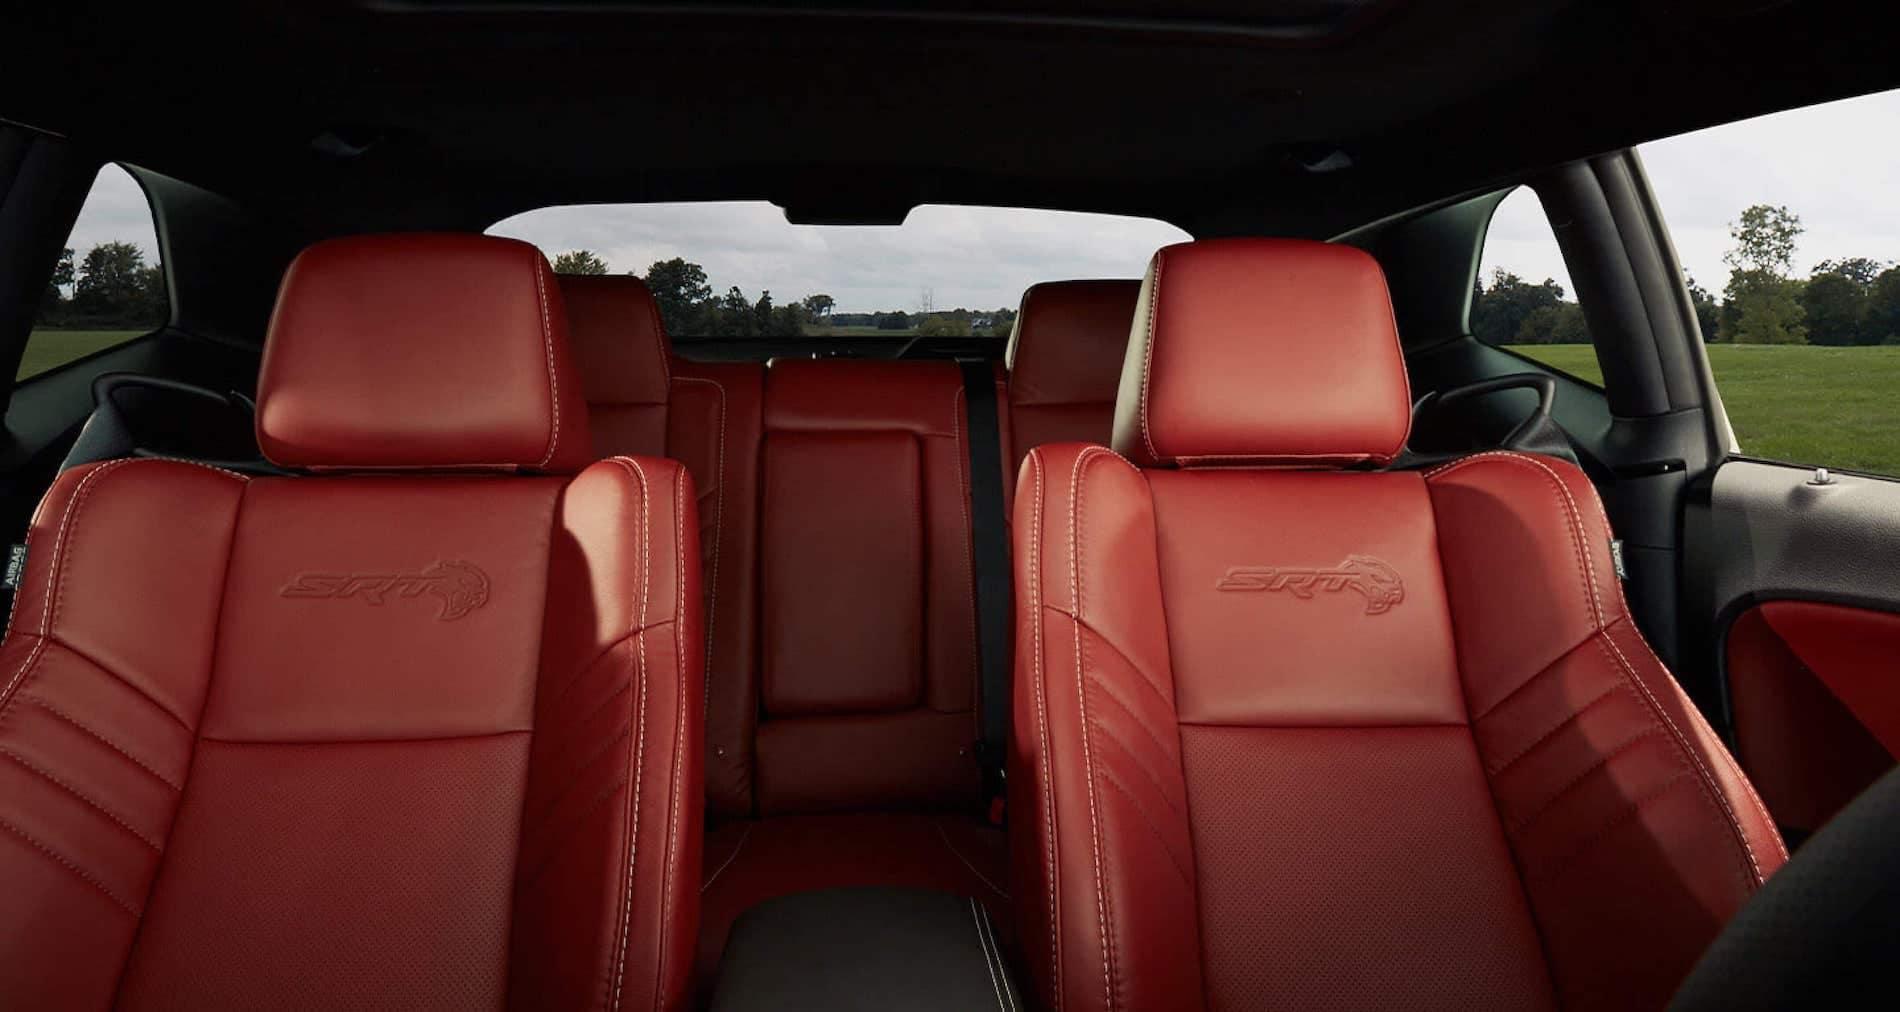 Dodge Challenger SRT interior overview